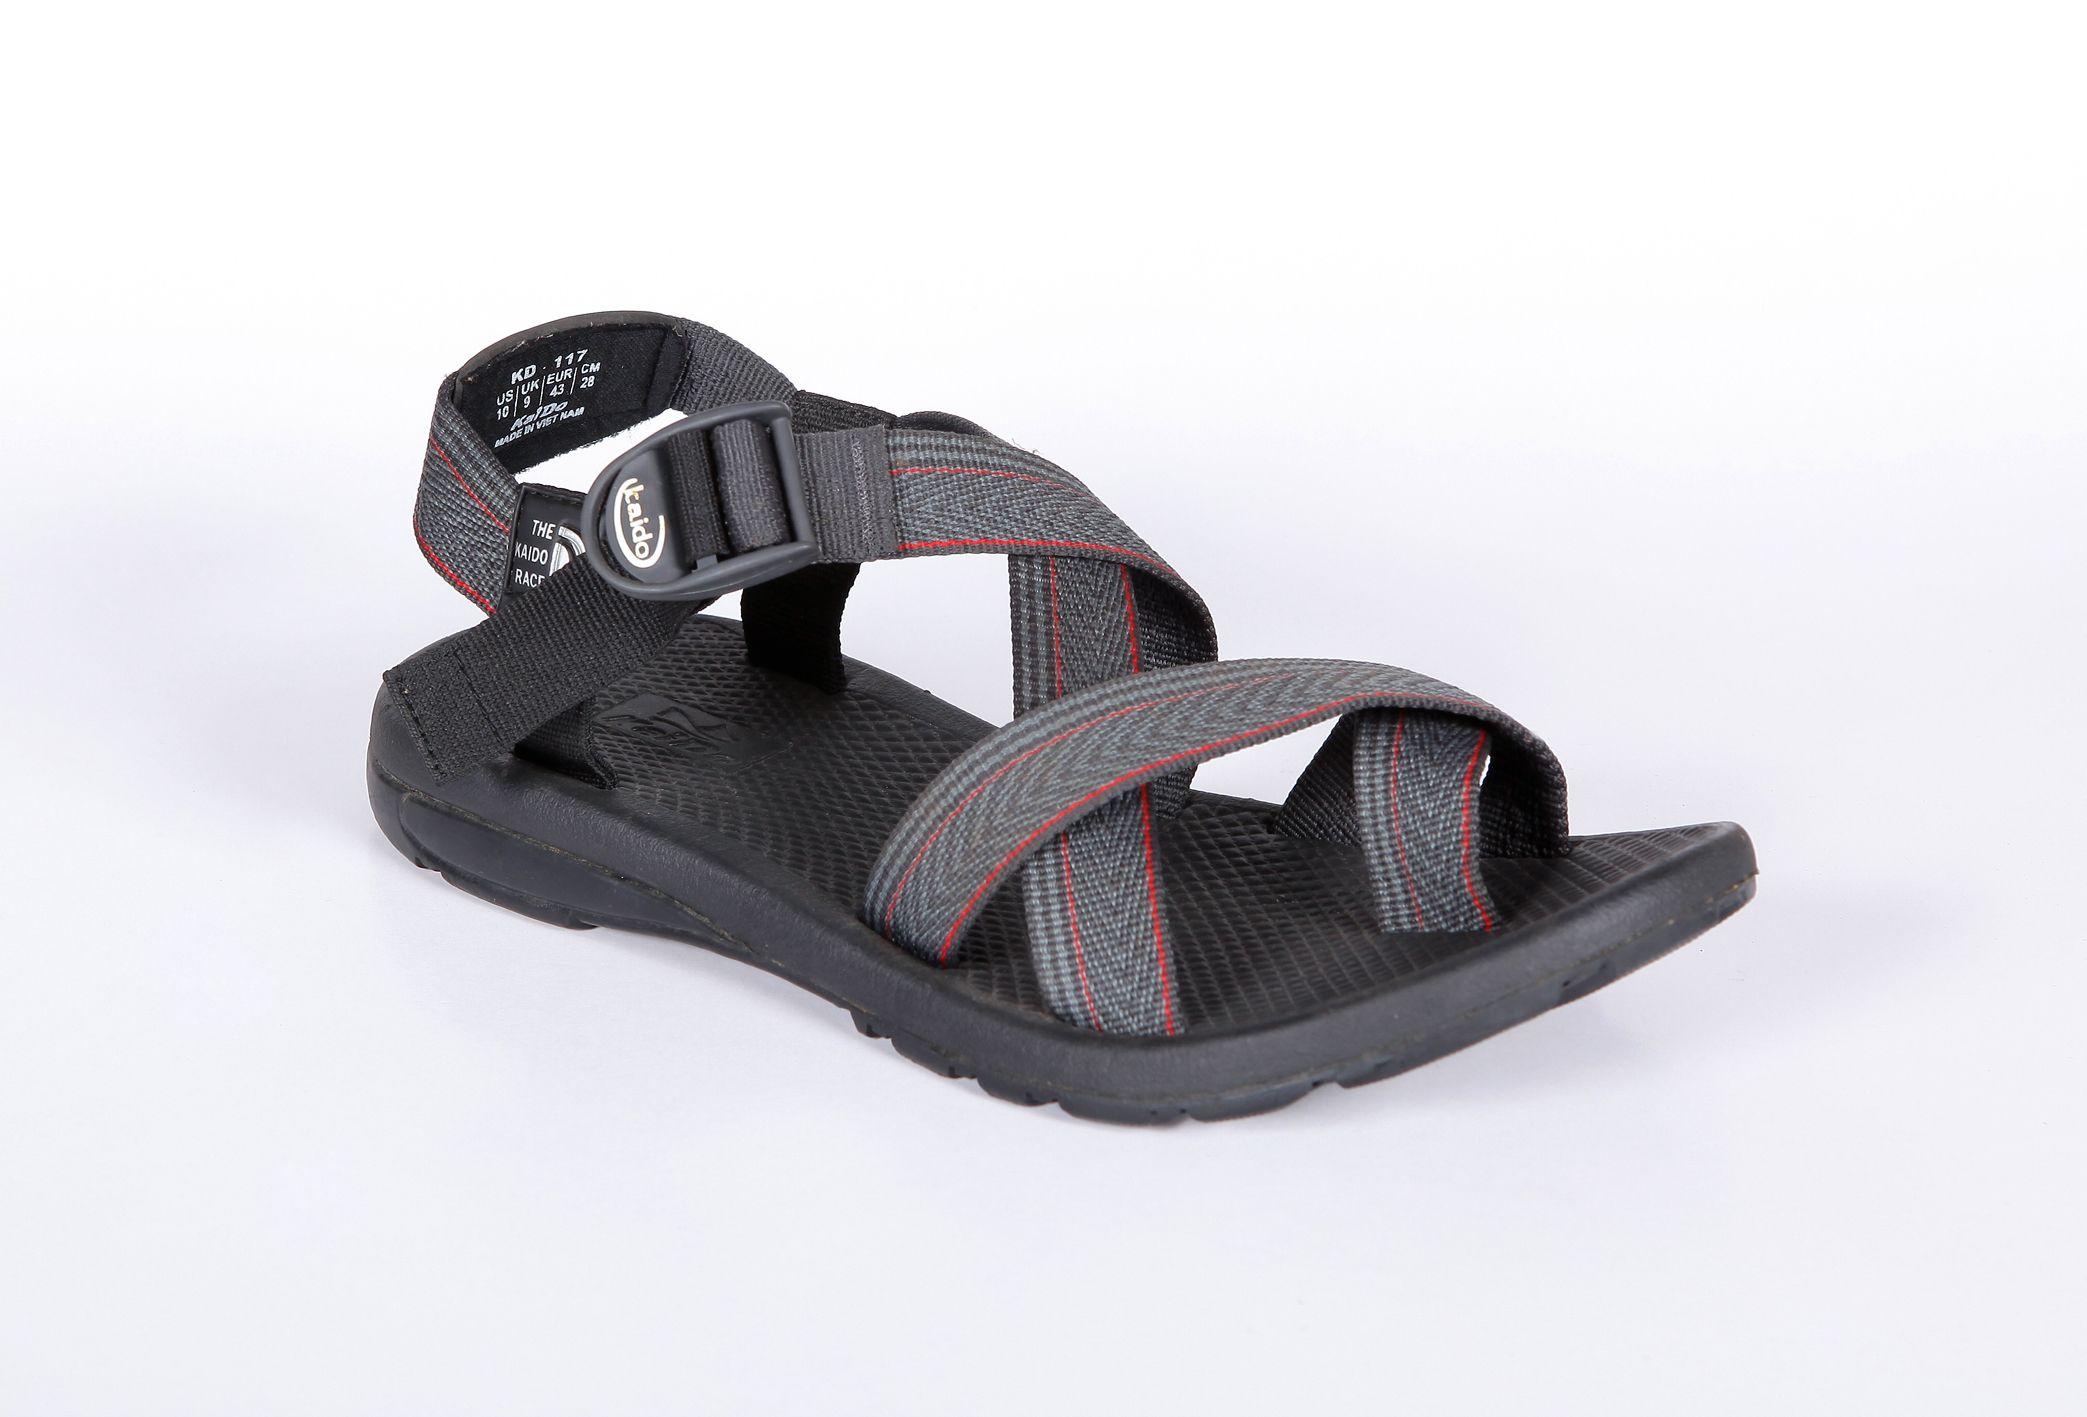 e945bc006647db Kaido Men Sandals KD 117